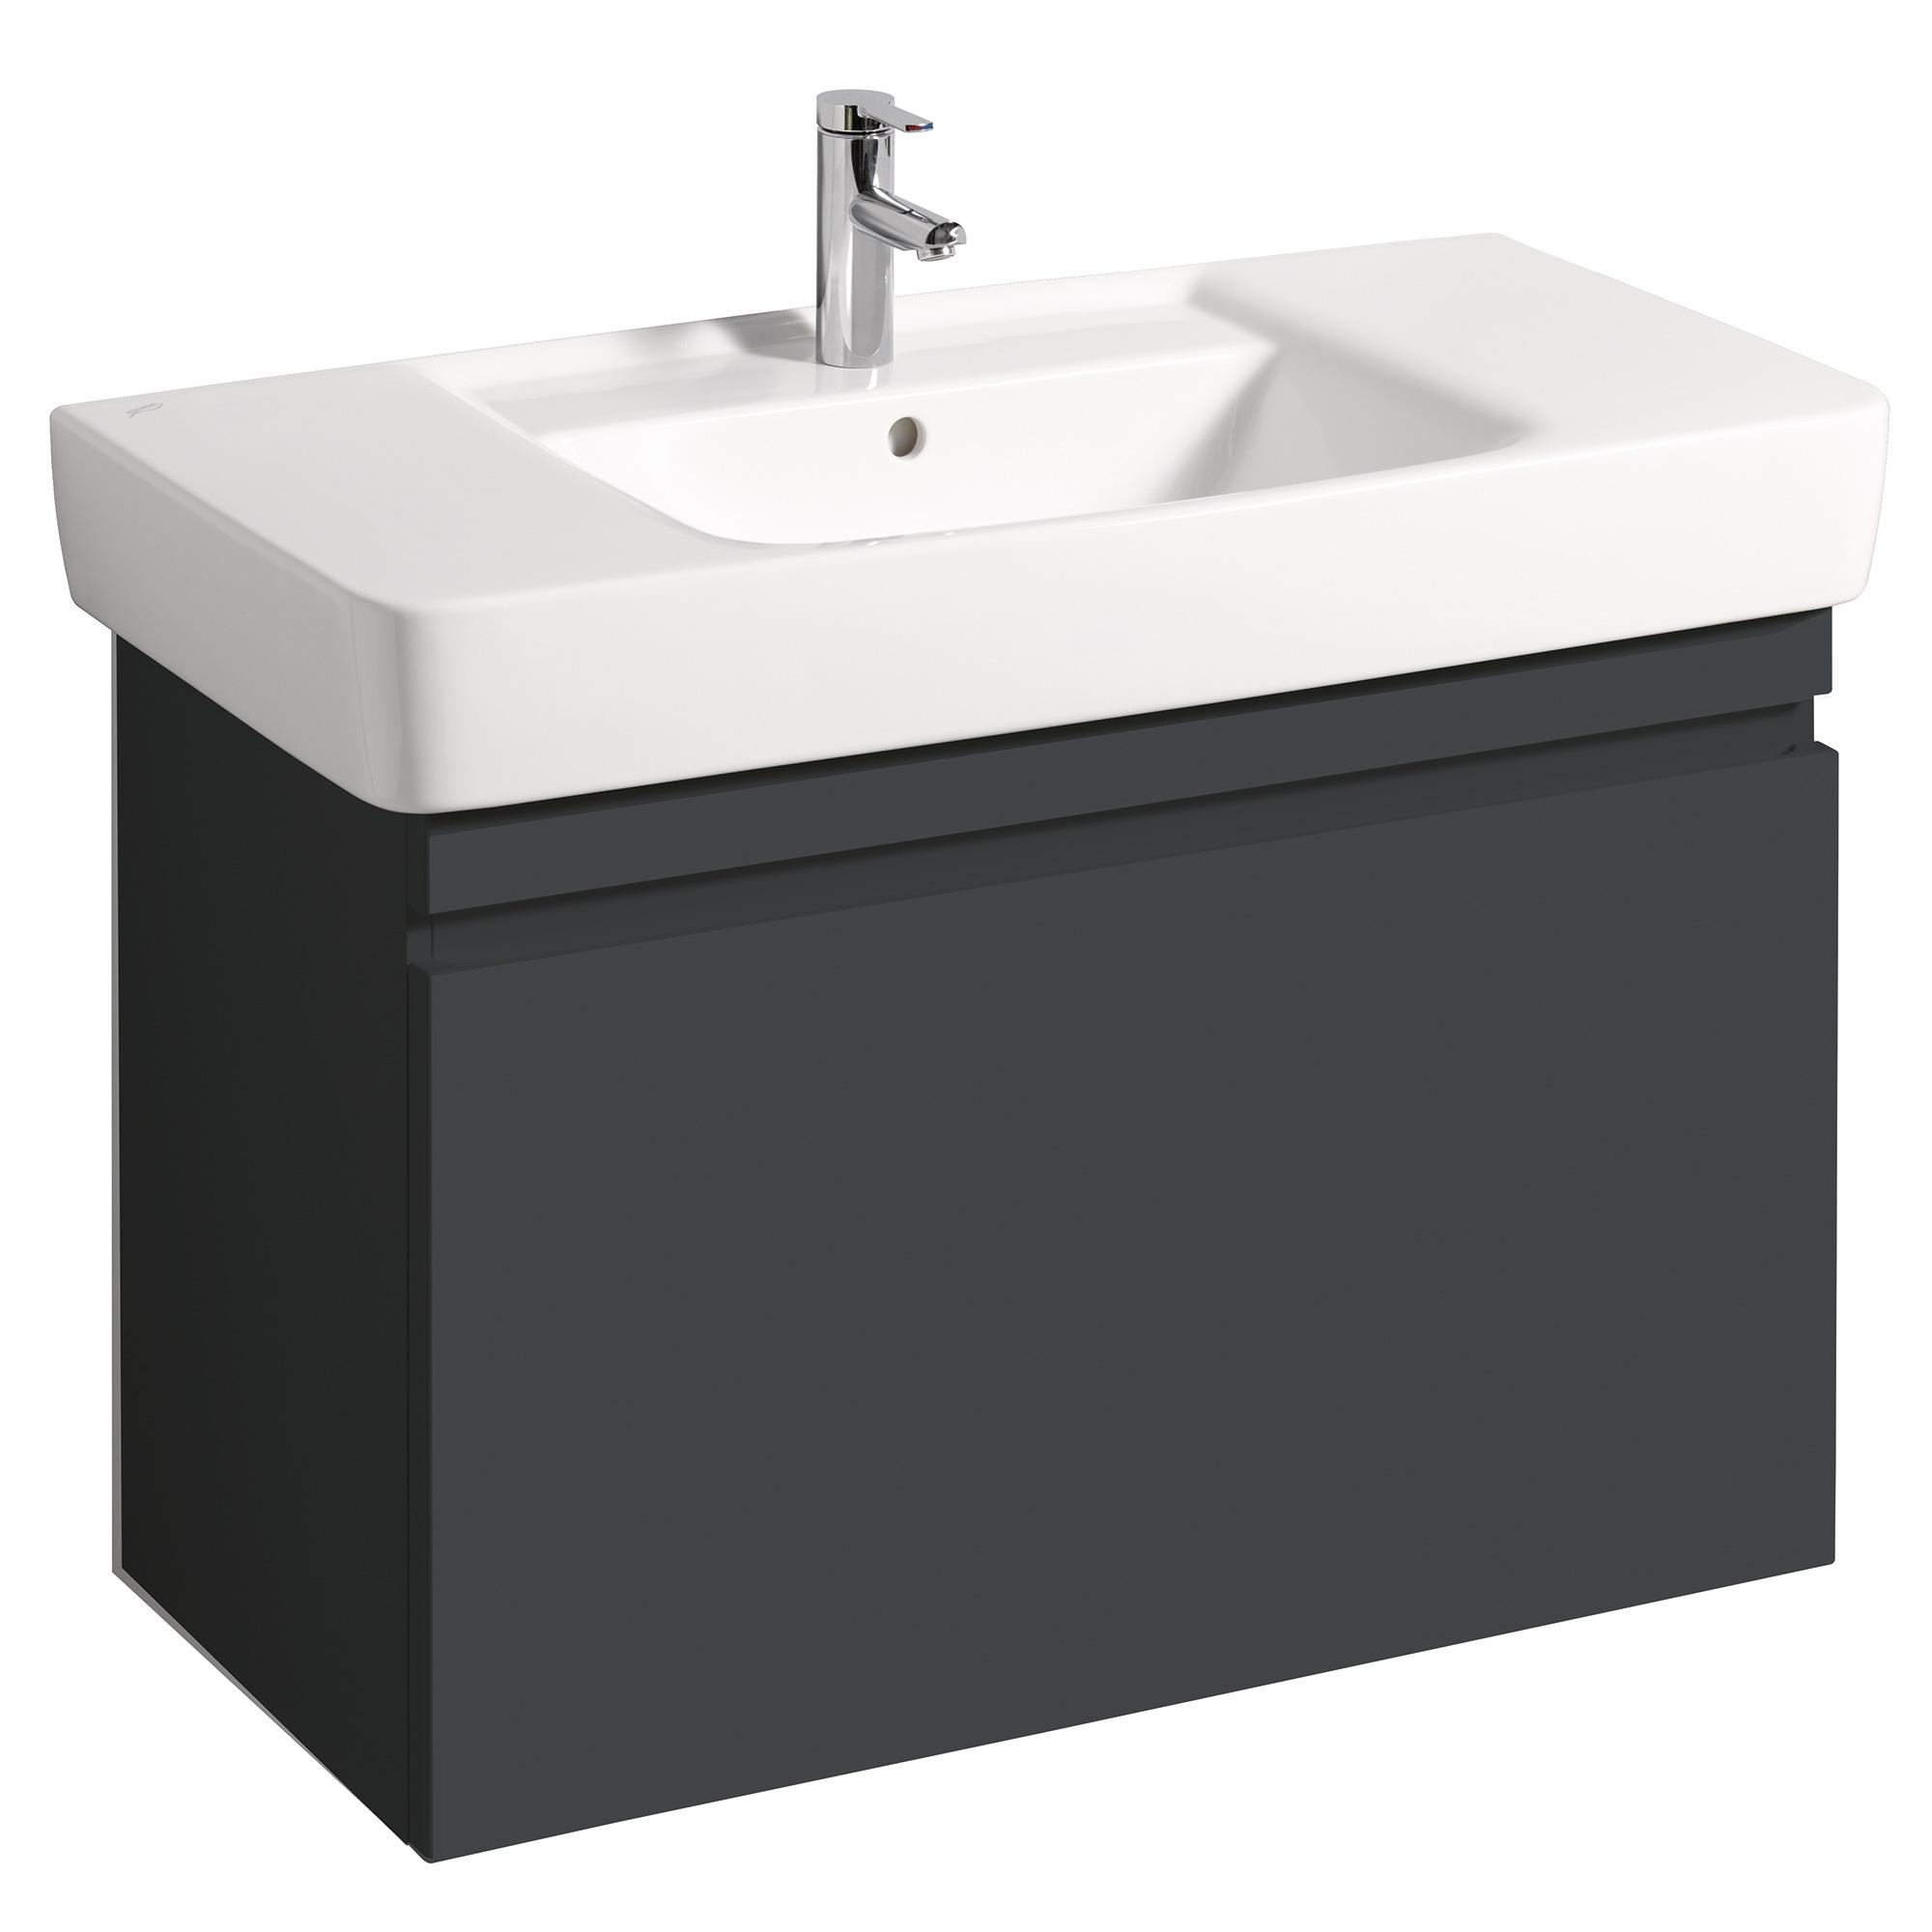 keramag renova nr 1 plan waschtischunterschrank b 92 6 h. Black Bedroom Furniture Sets. Home Design Ideas